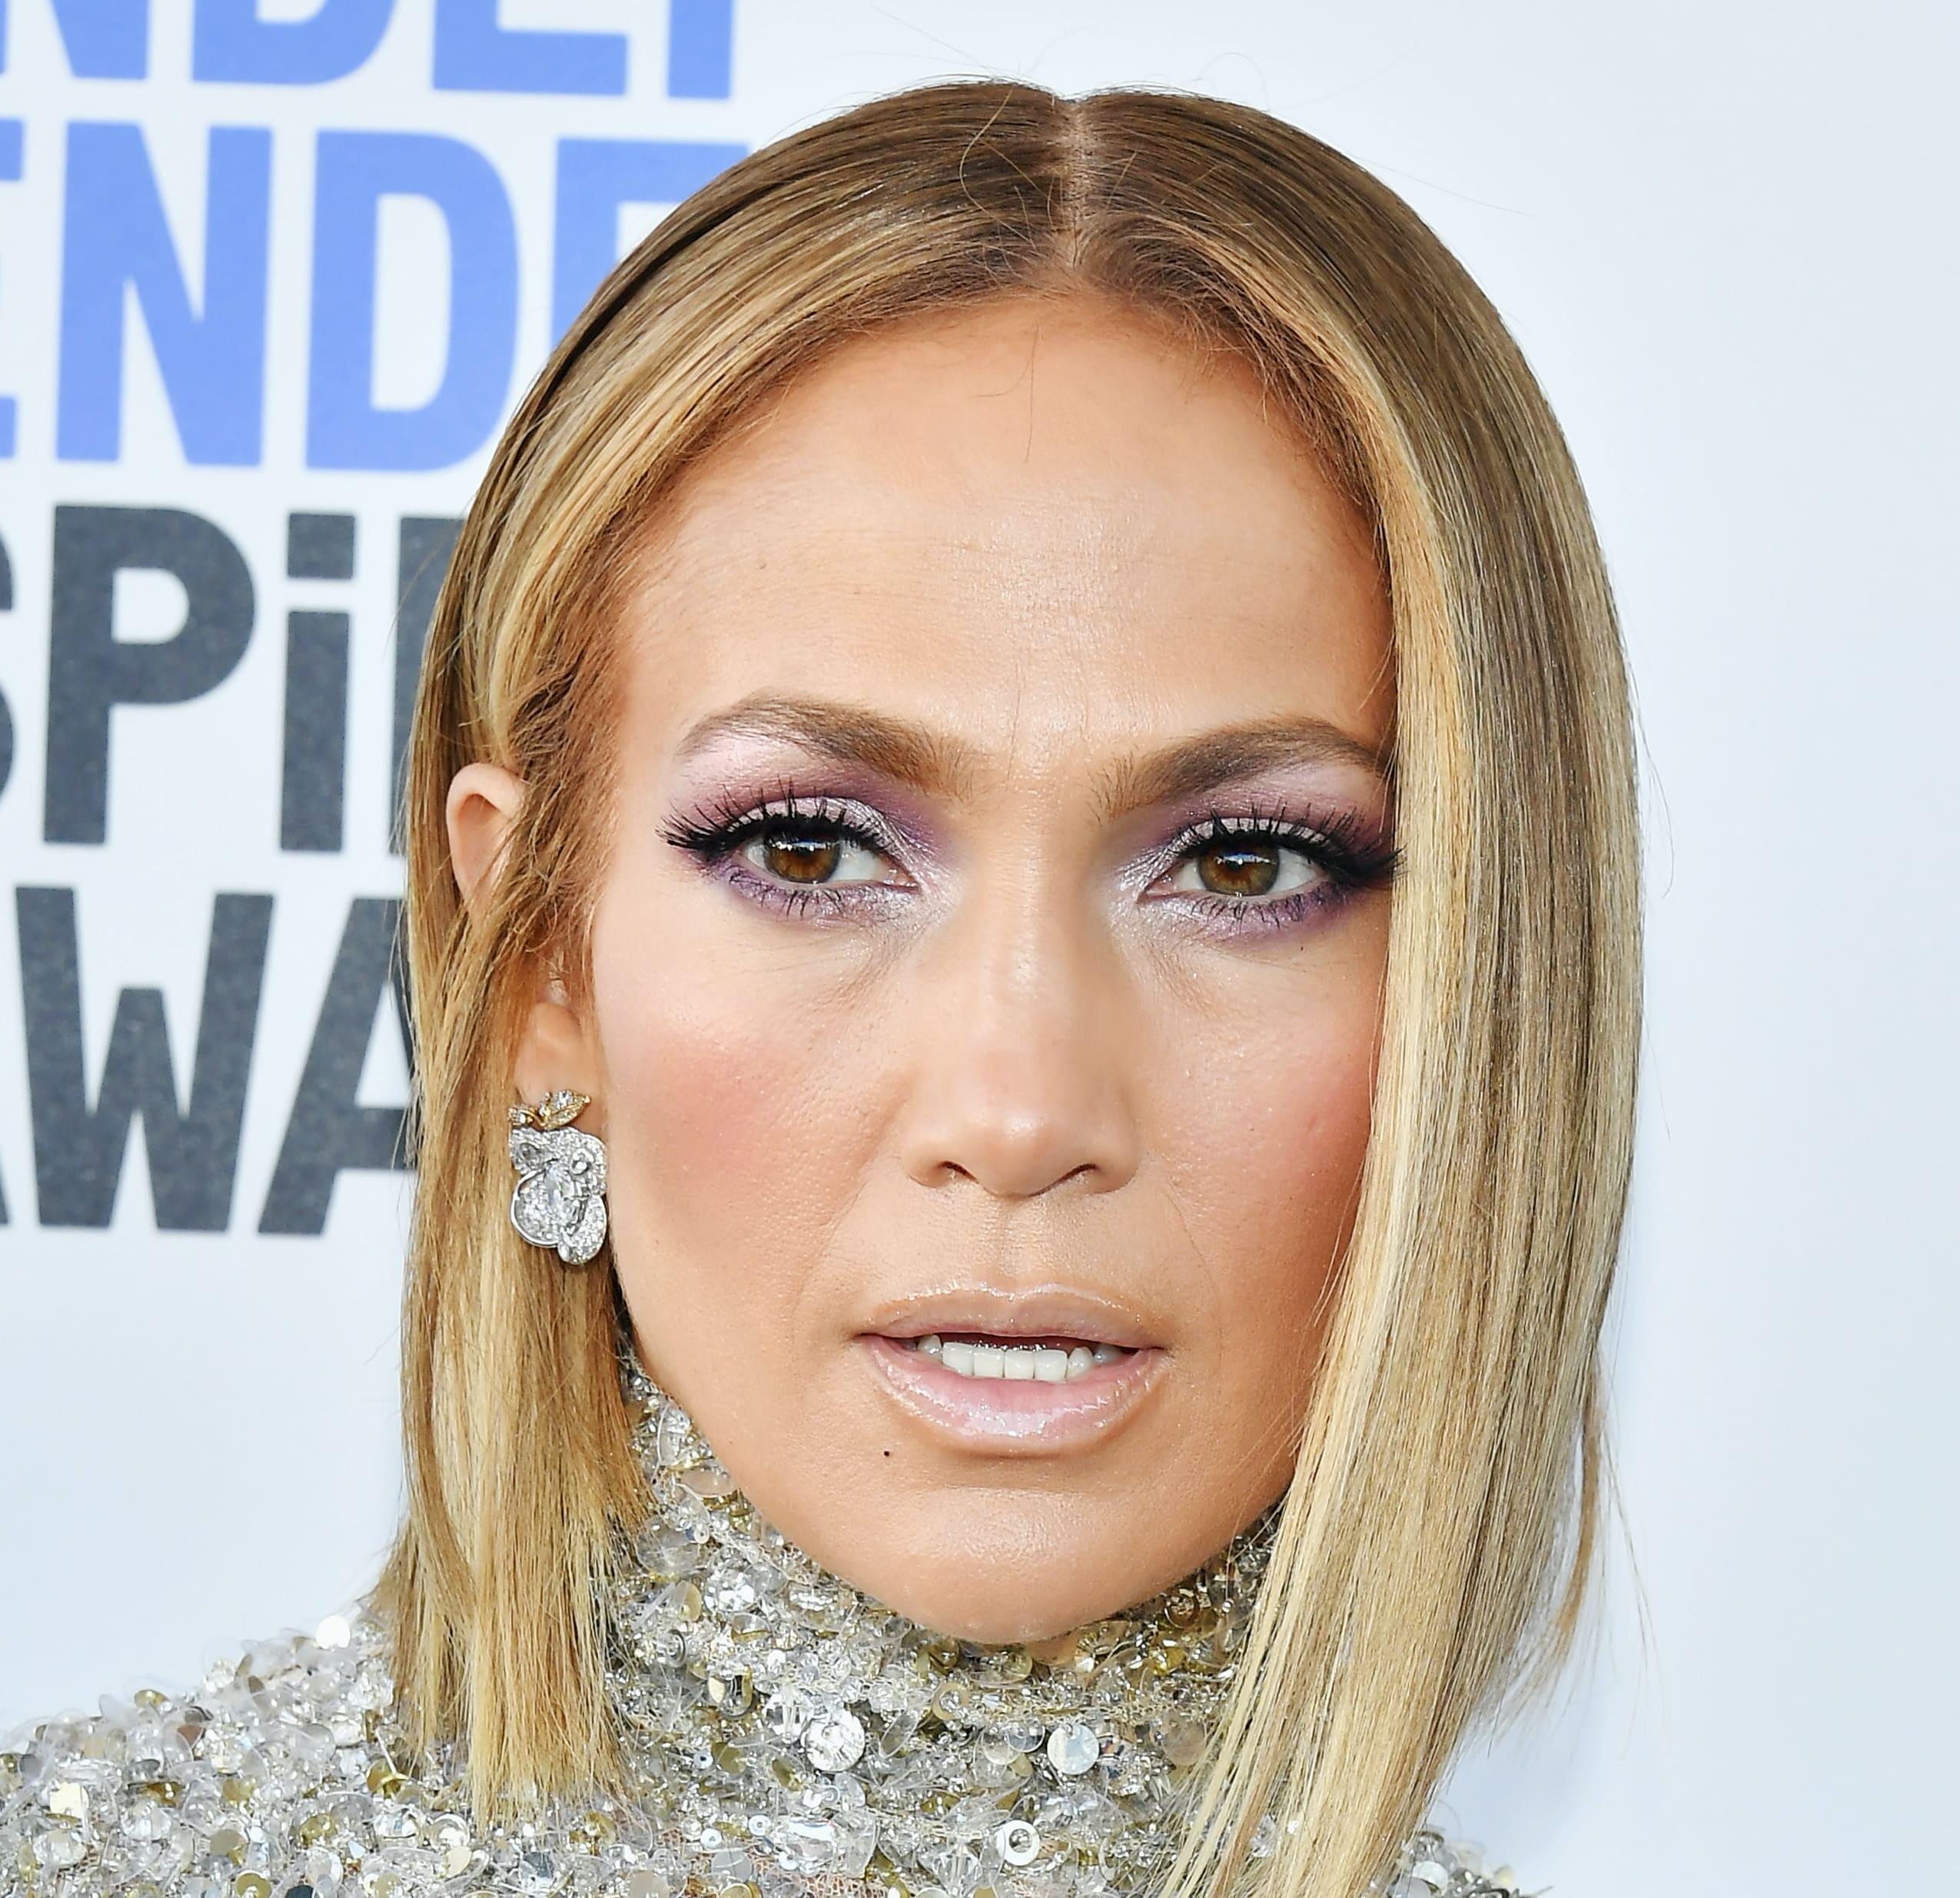 David Cruz Jennifer Lopez S High School Sweetheart Dies At 51 The Hollywood Gossip